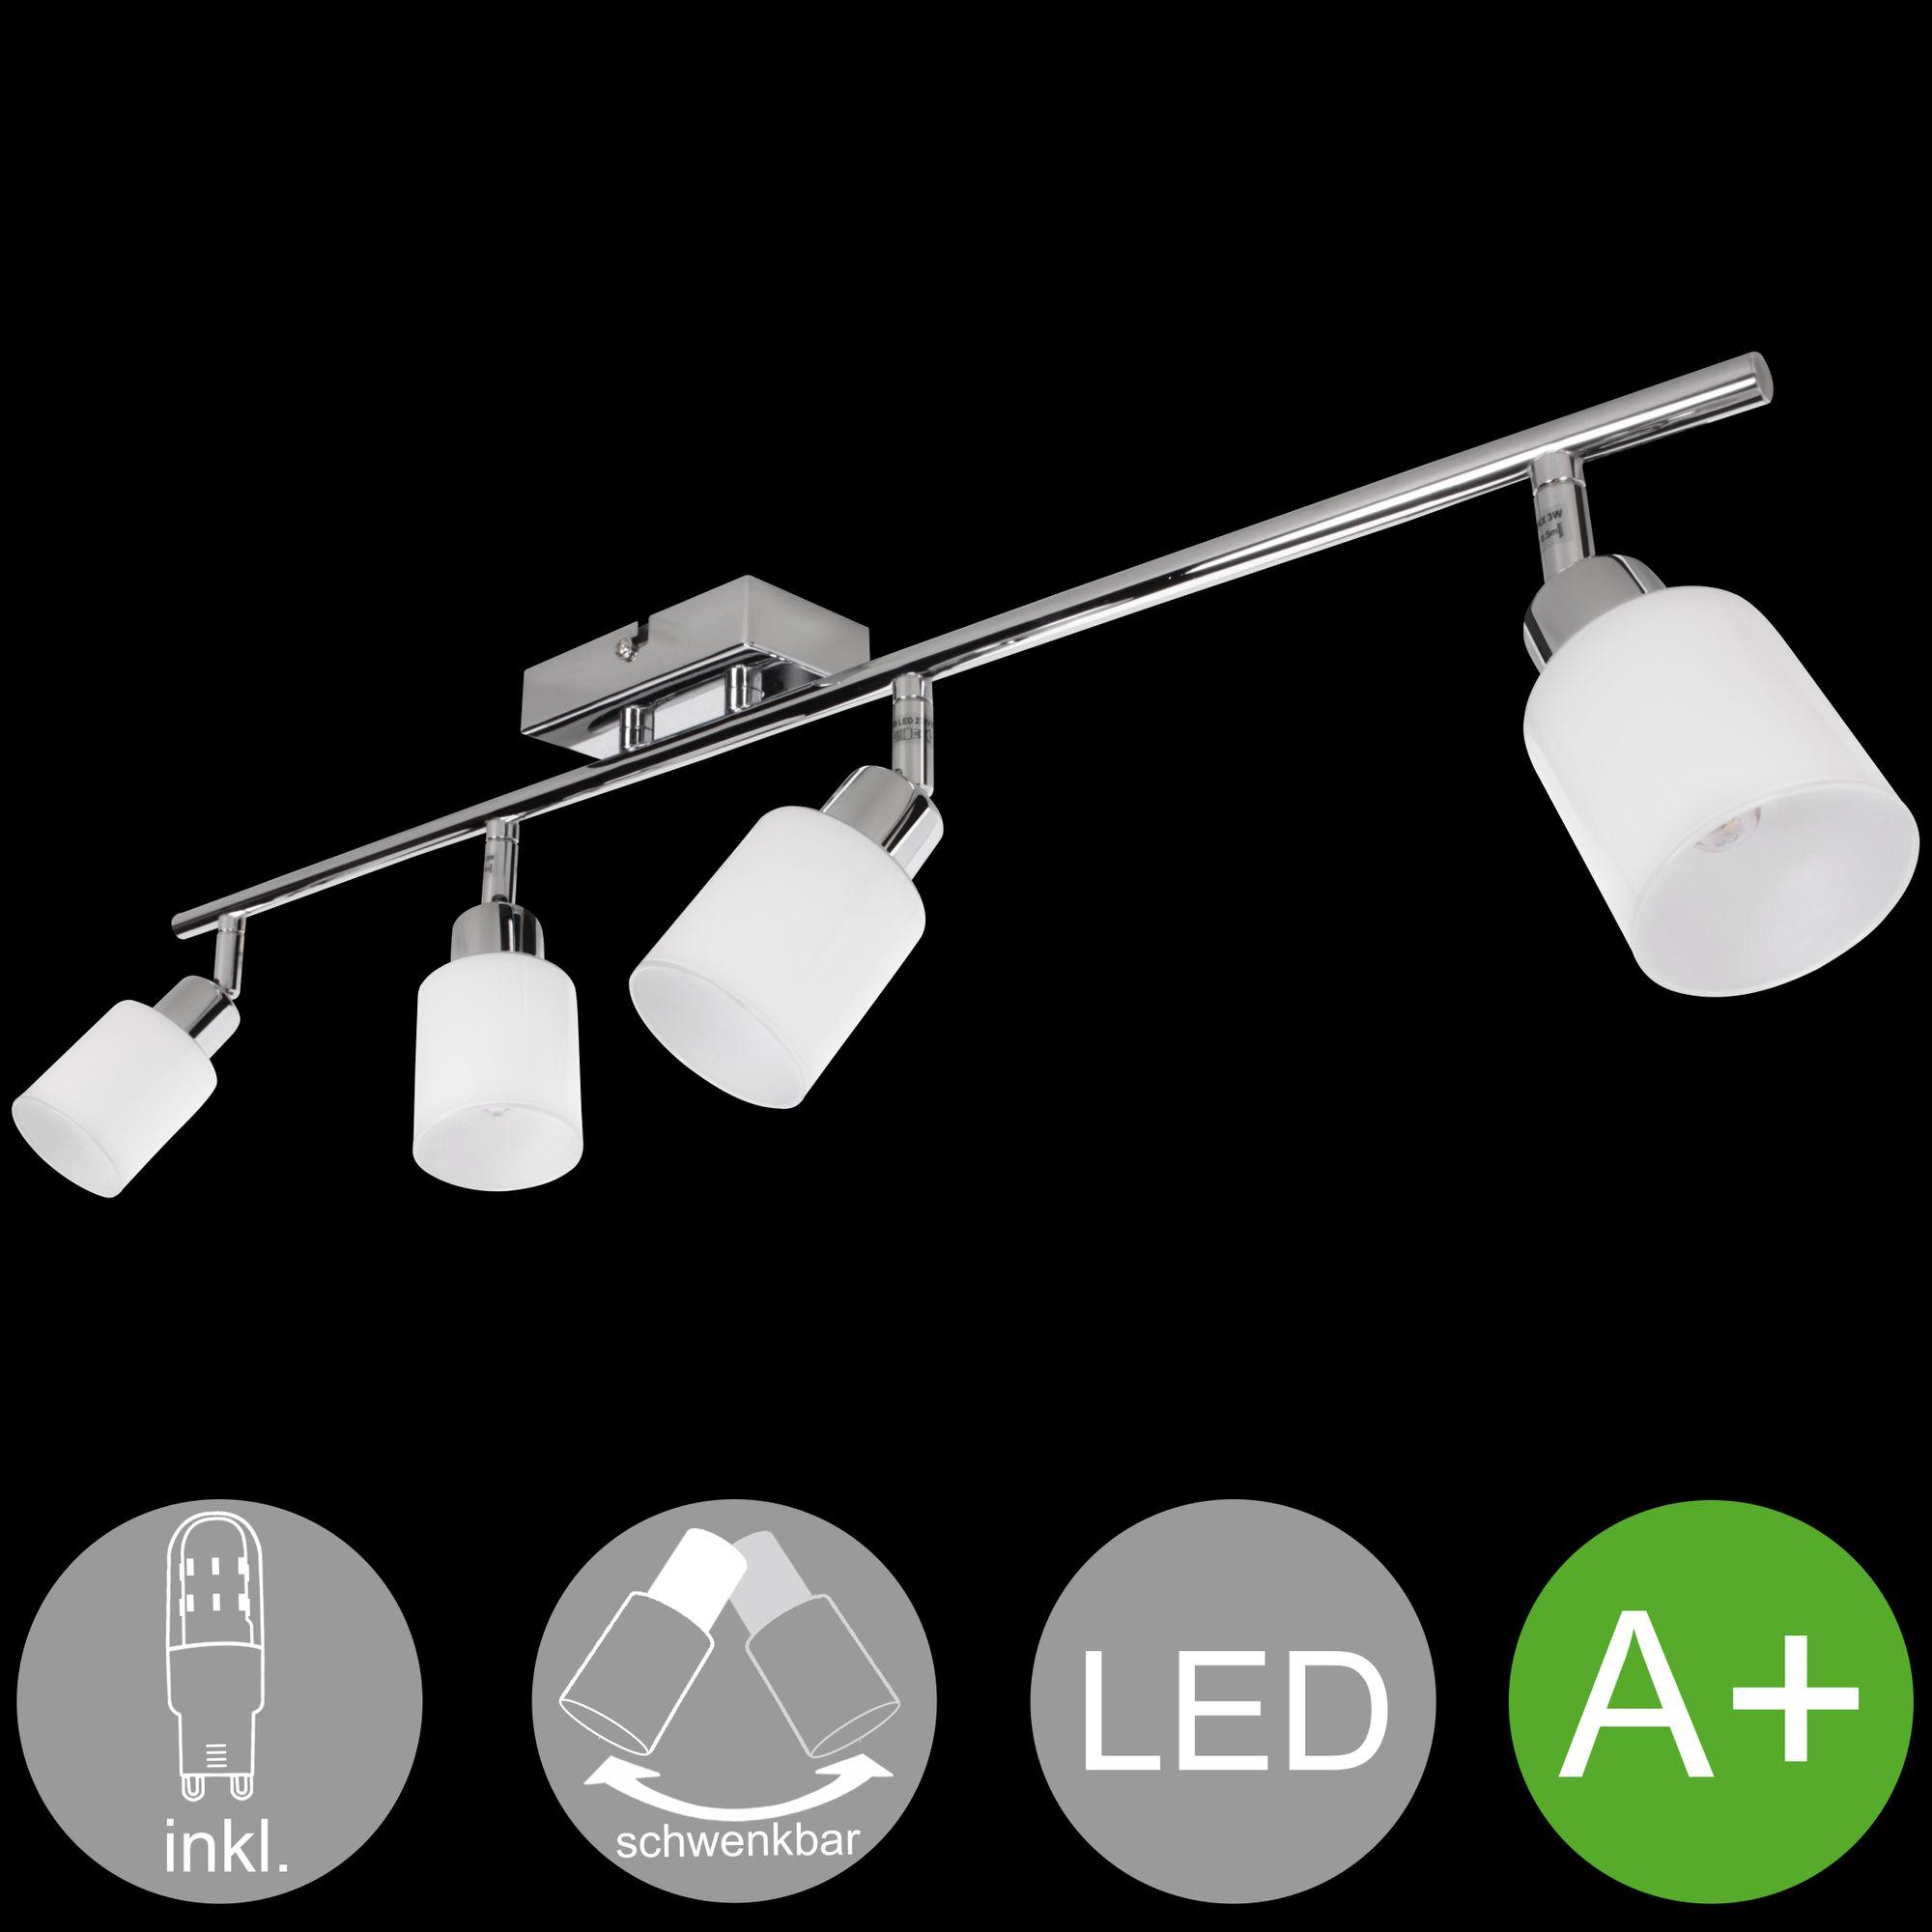 Top FineBuy 4 flammige LED Deckenleuchte Lampe Strahler Spot Leuchte AW53